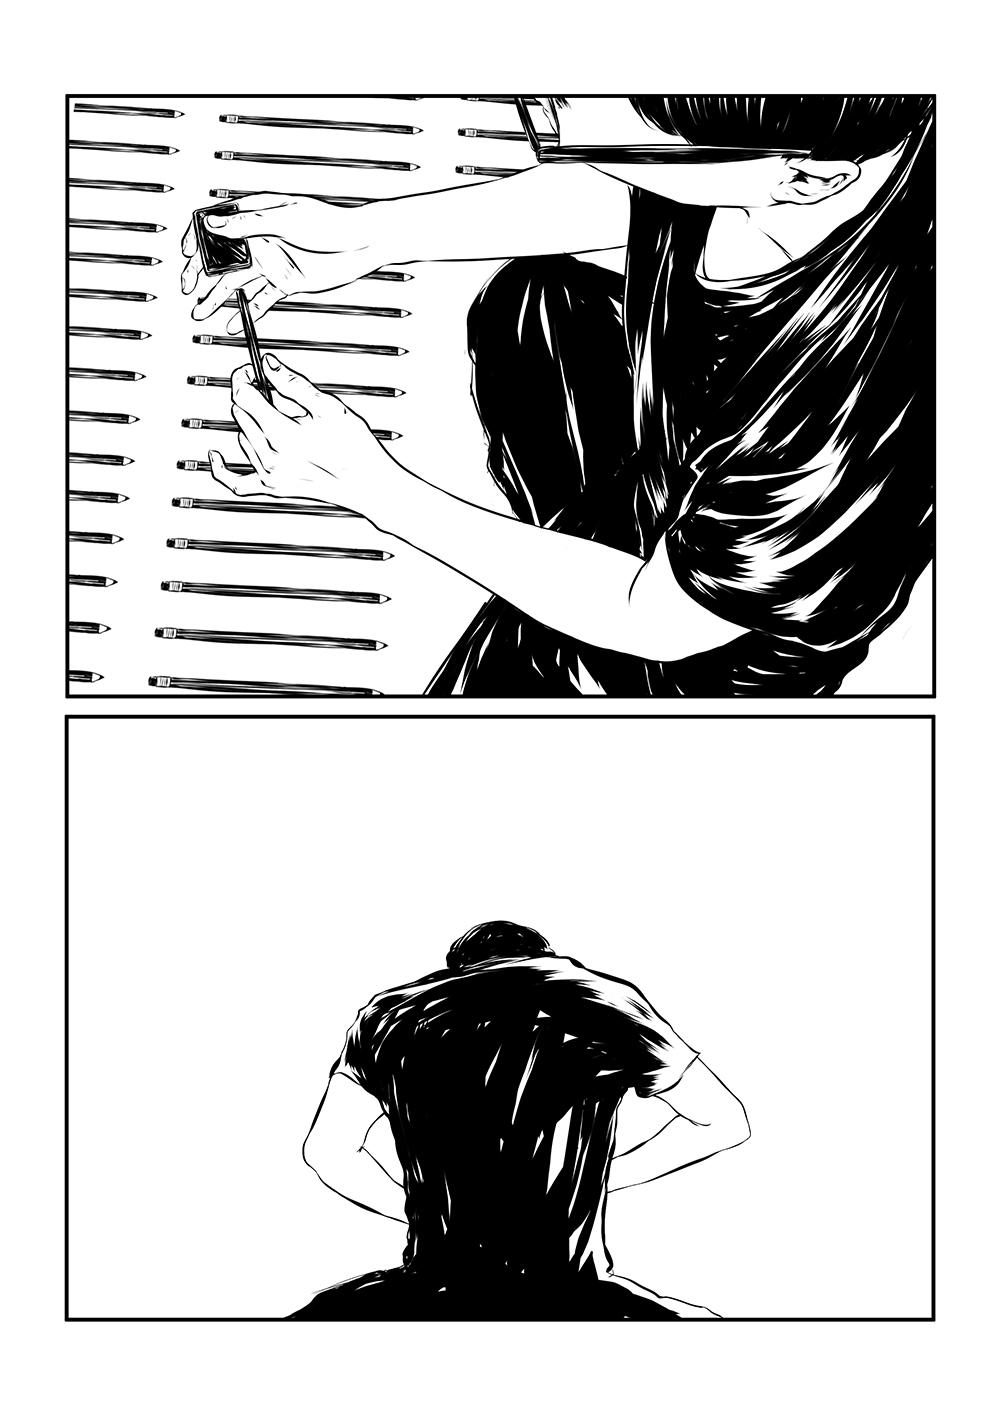 mojowang_illustration_betweenrivers_2_3.jpg